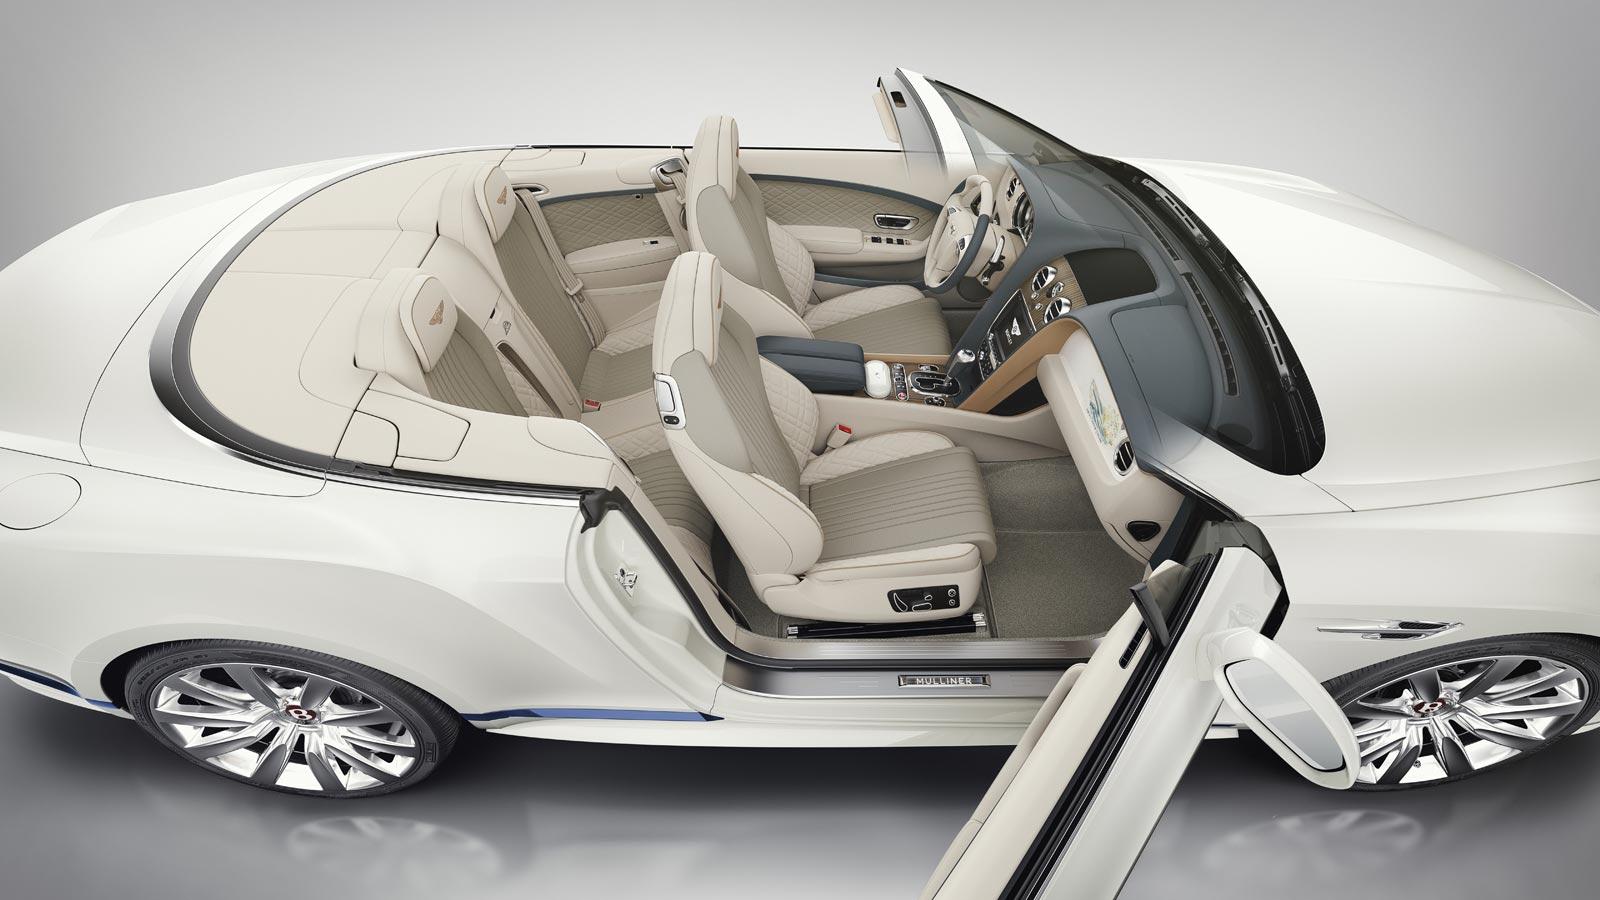 Bentley Motors and Princess Yachts Continental GT Convertible Galene Edition 8